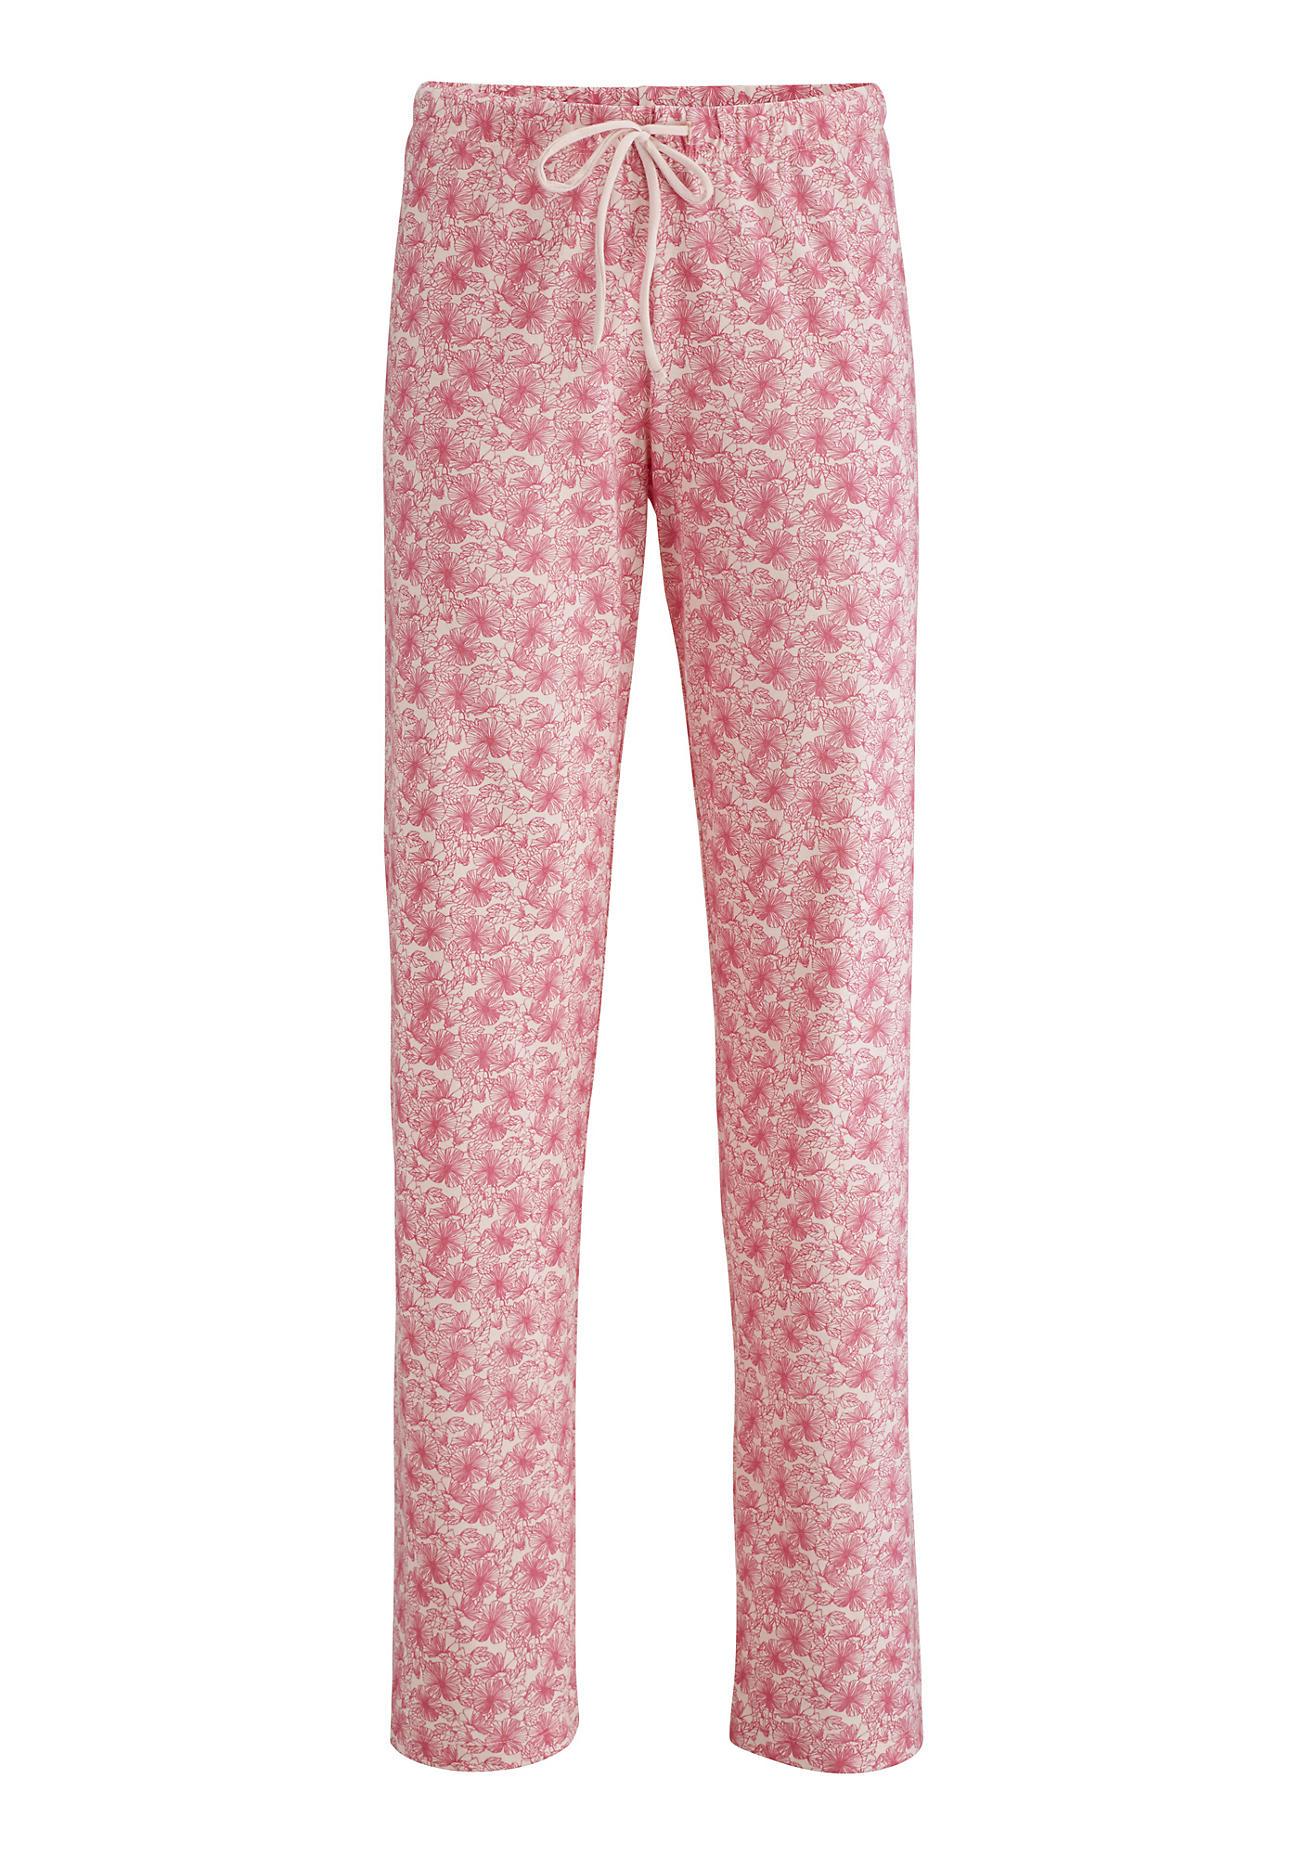 hessnatur Damen Damen Pyjamahose aus Bio-Baumwolle – rosa – Größe 48